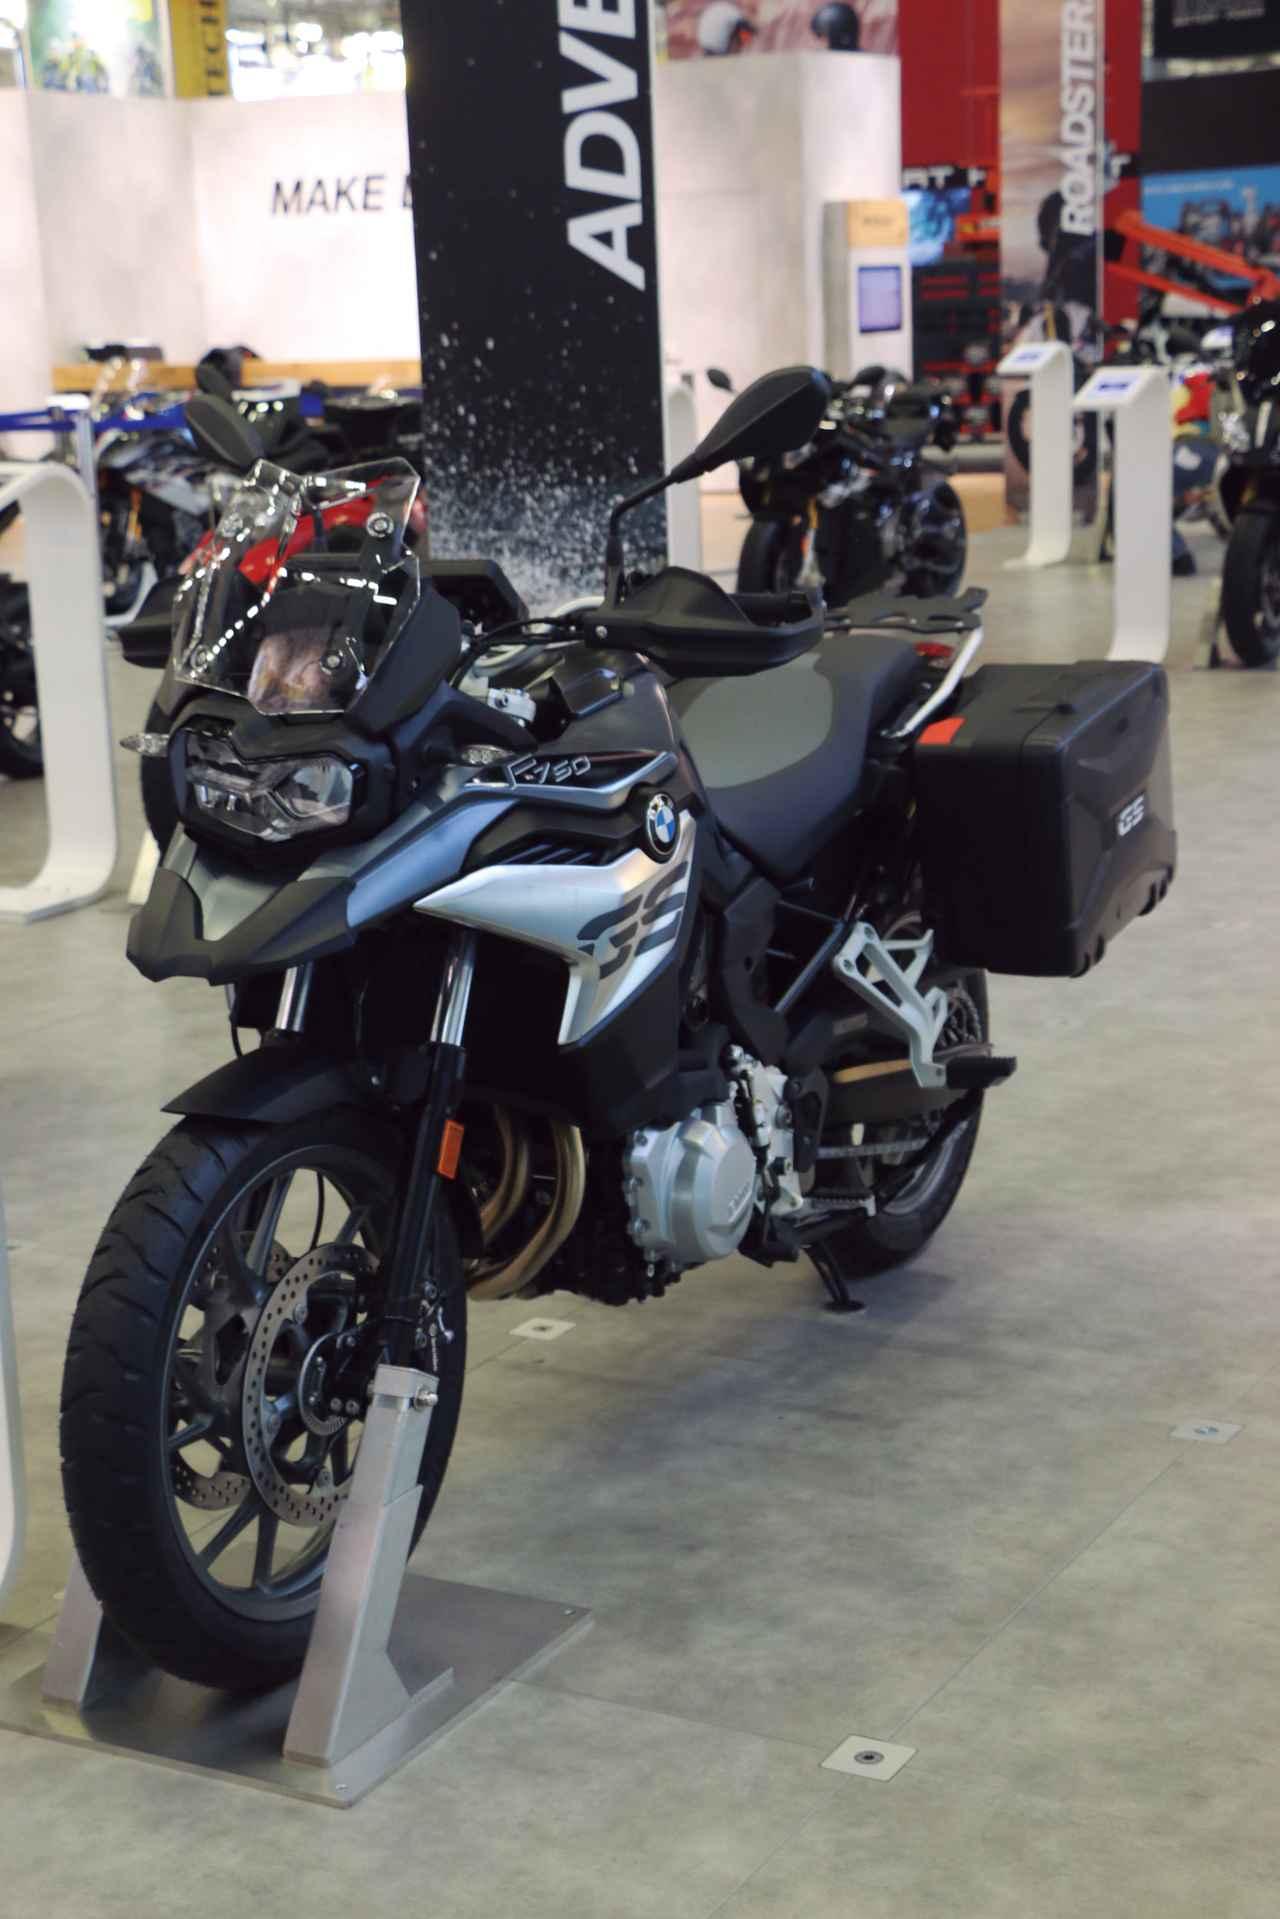 Images : 3番目の画像 - 「オールラウンドなミドルGS、新世代モデルに進化! 『BMW F750GS』」のアルバム - webオートバイ